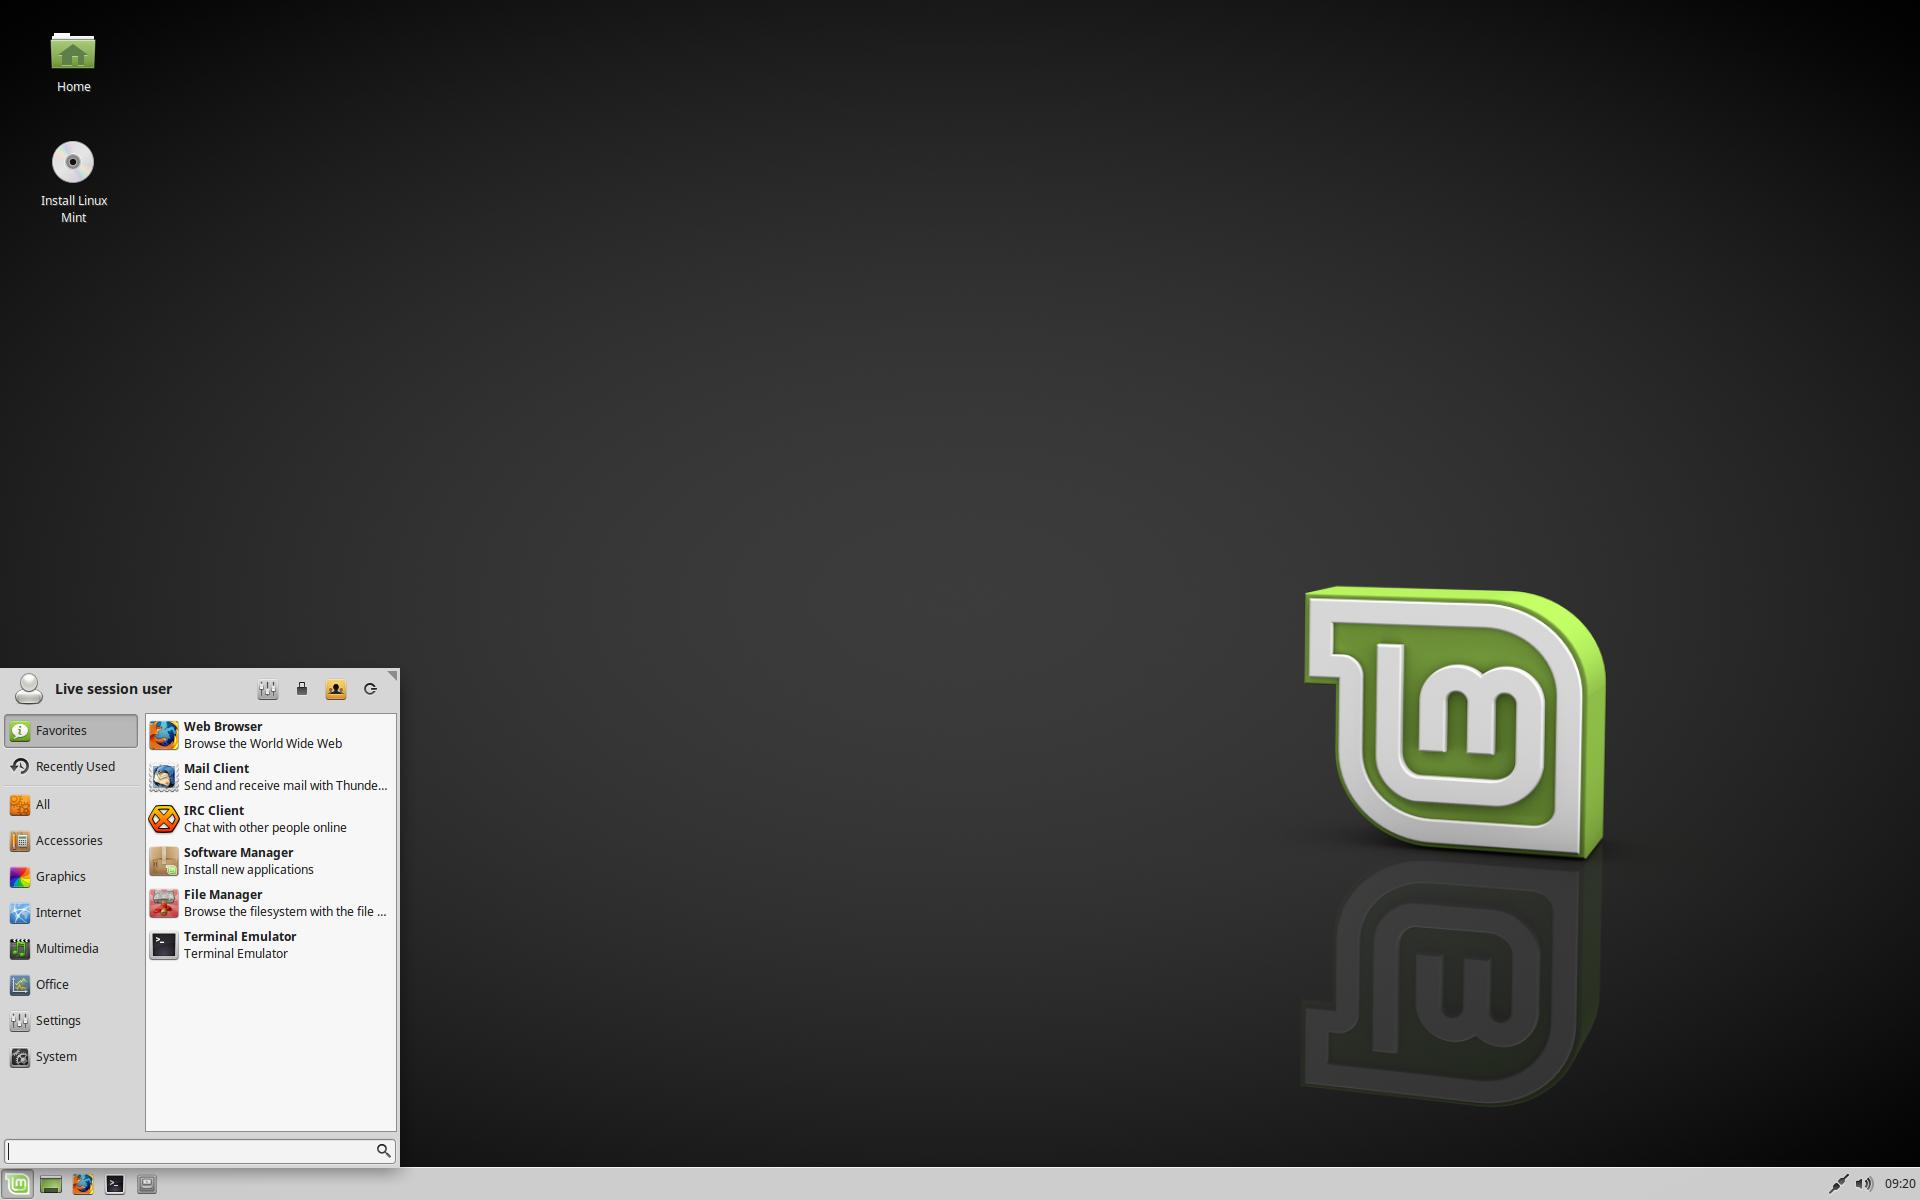 Linux Mint 18.1 xfce